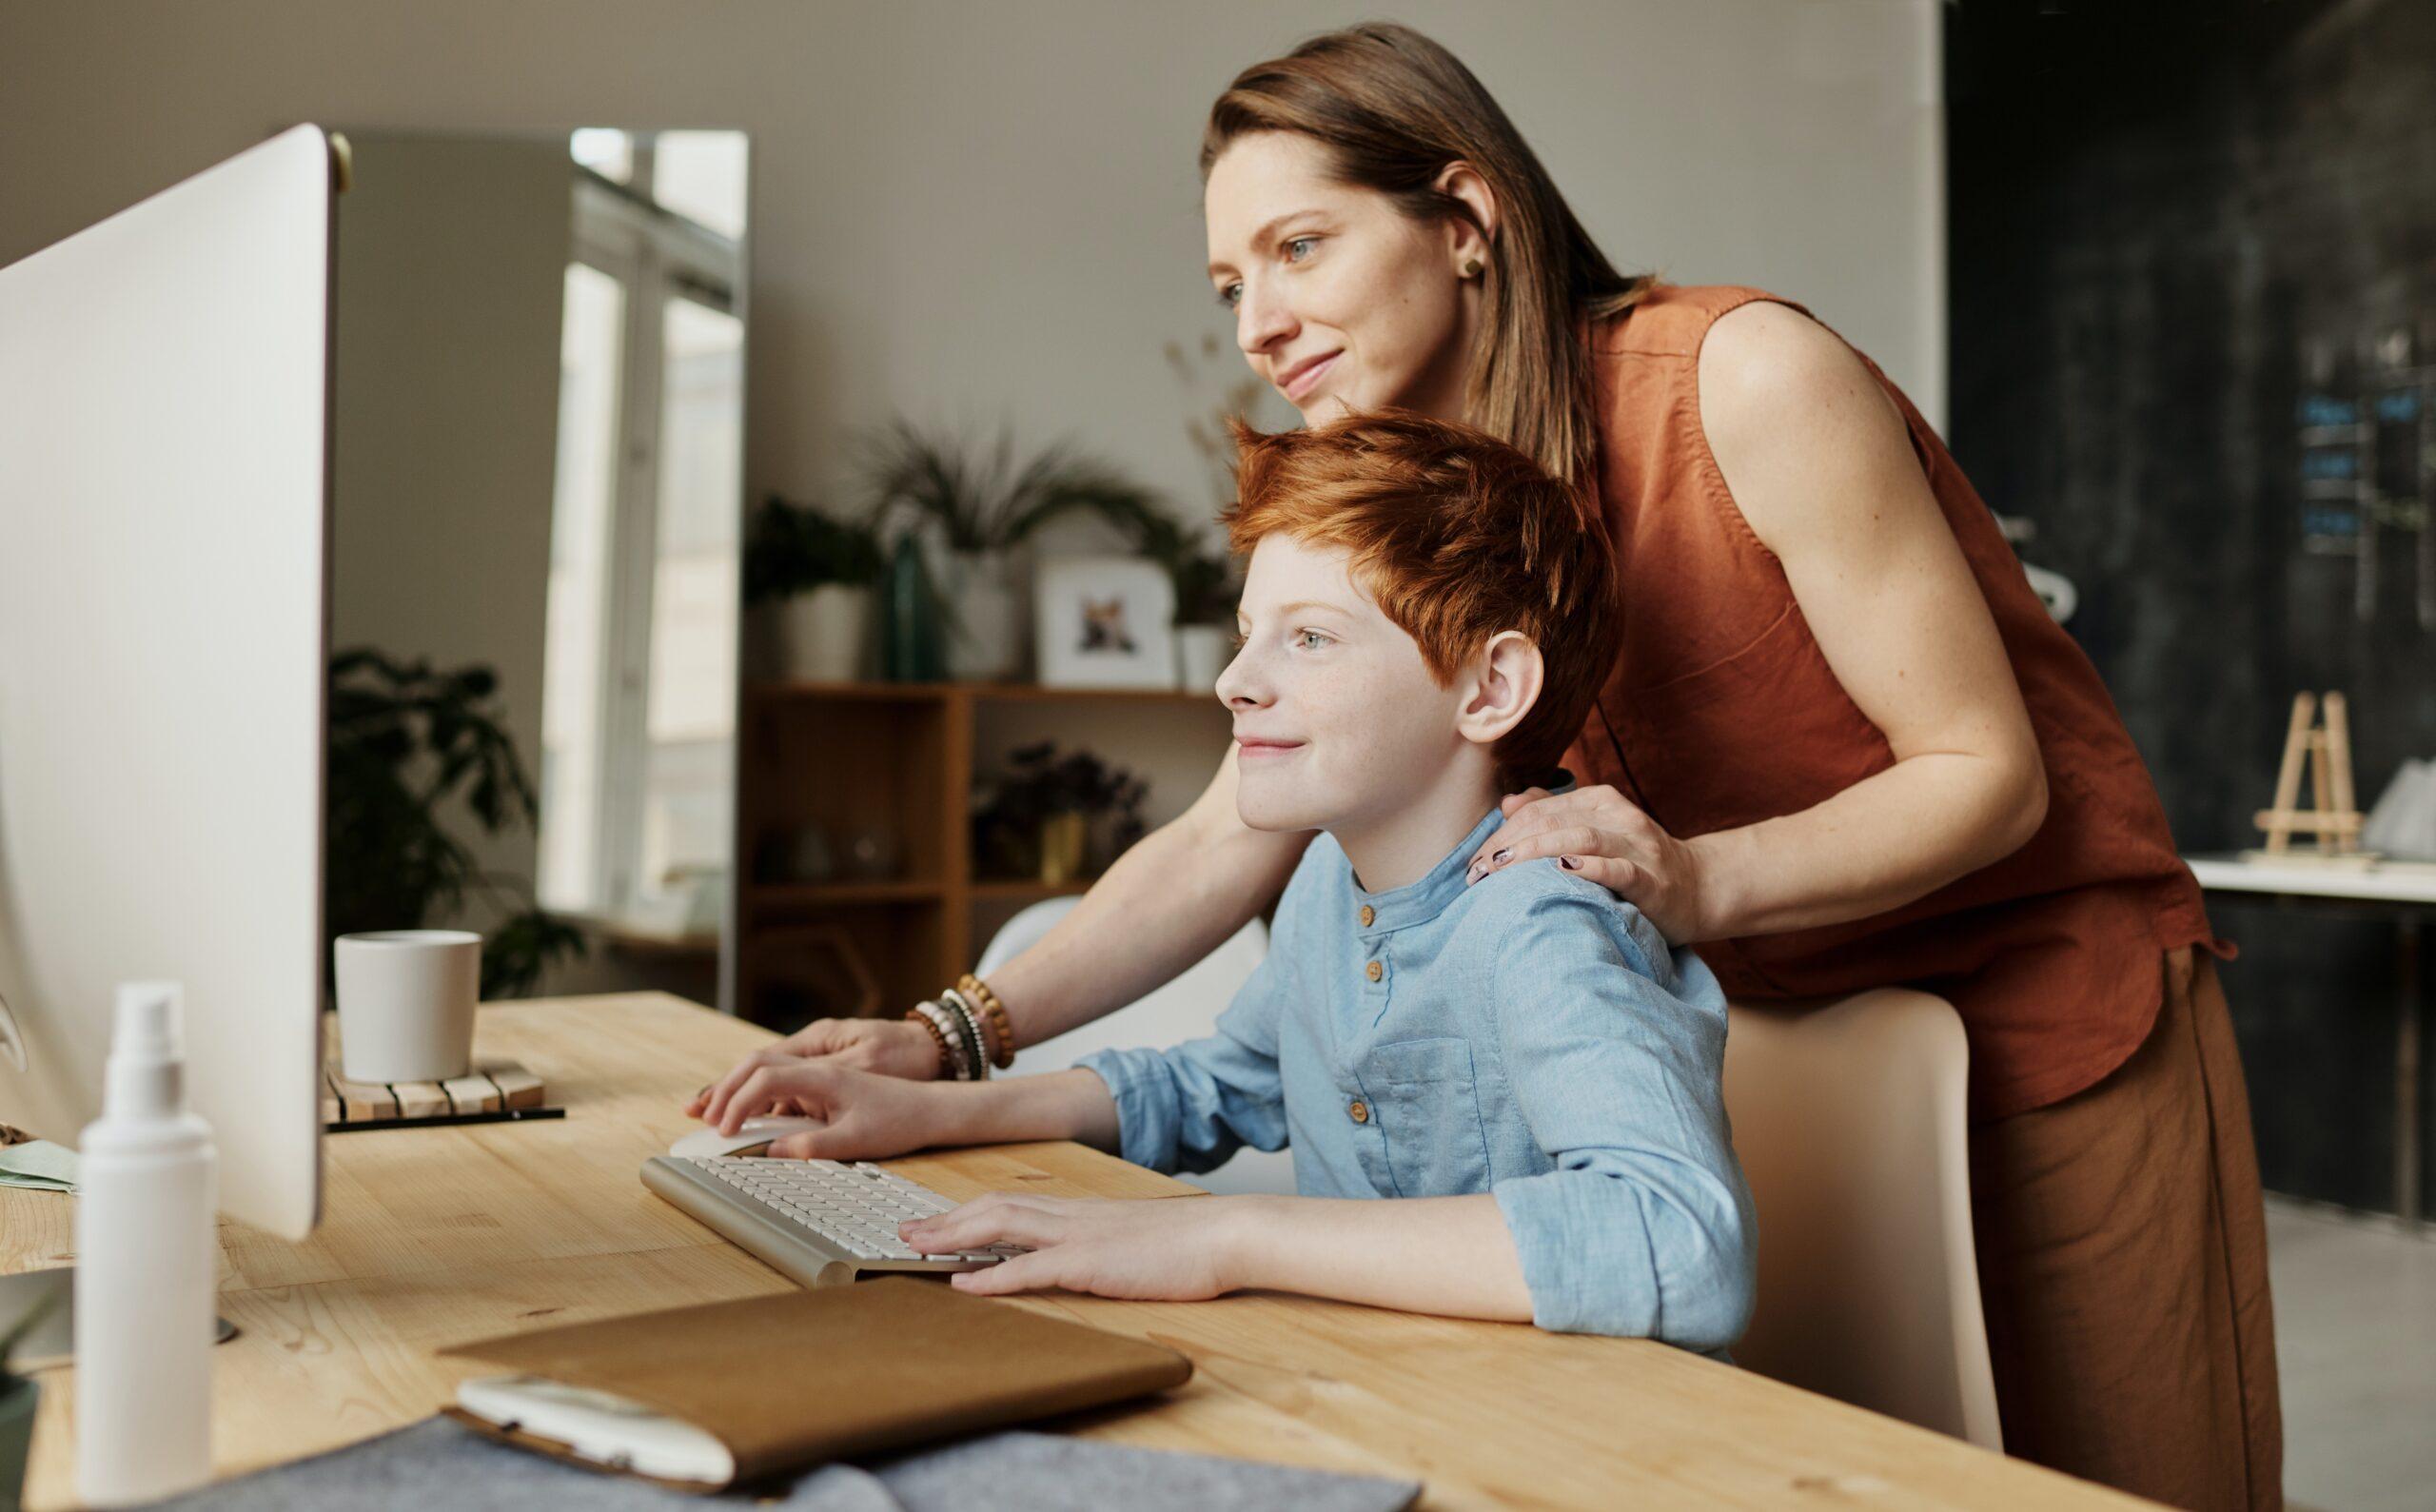 child's education involvement